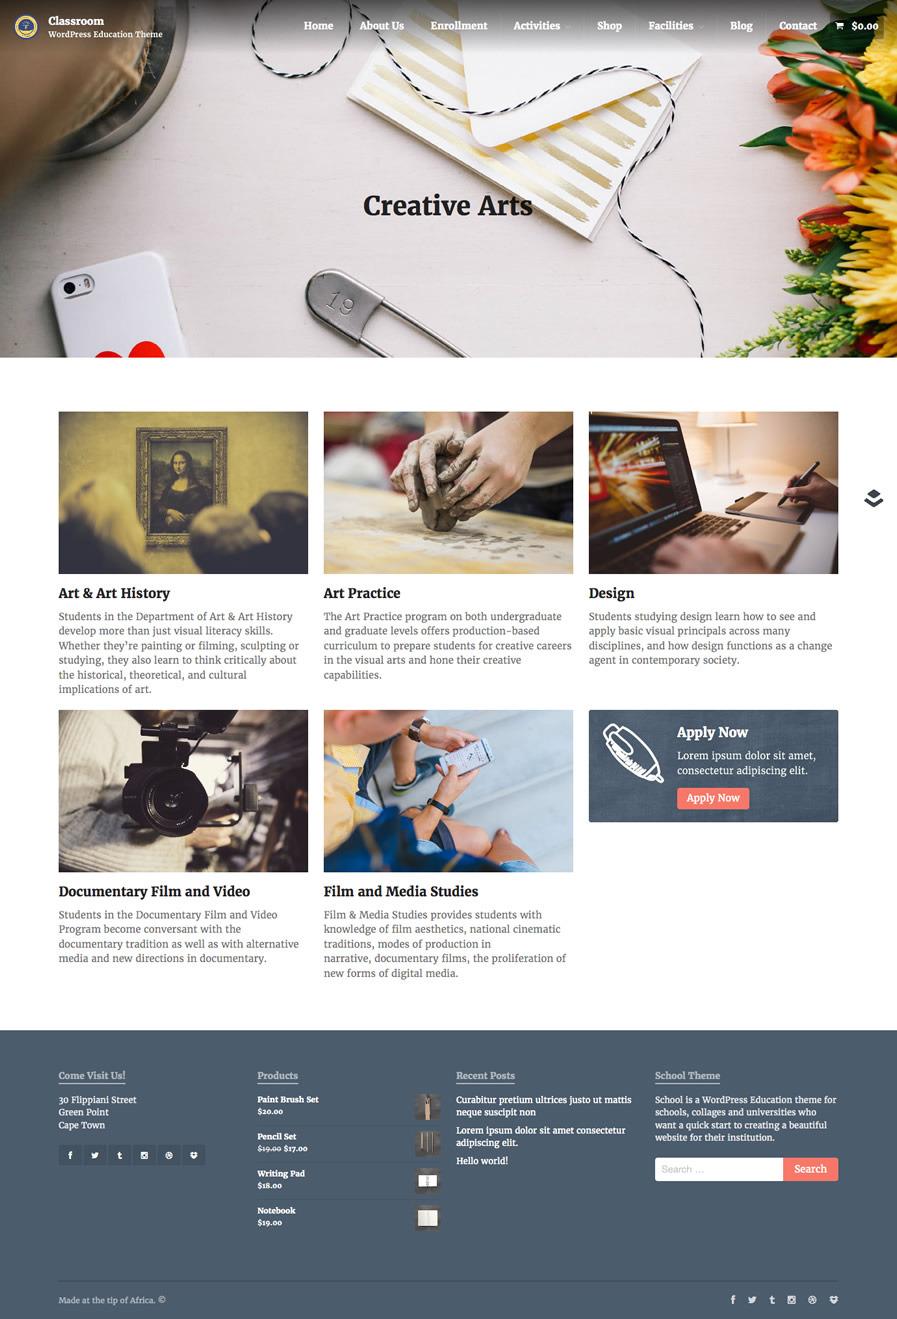 Responsive Classroom Design ~ Classroom responsive wordpress school theme by obox